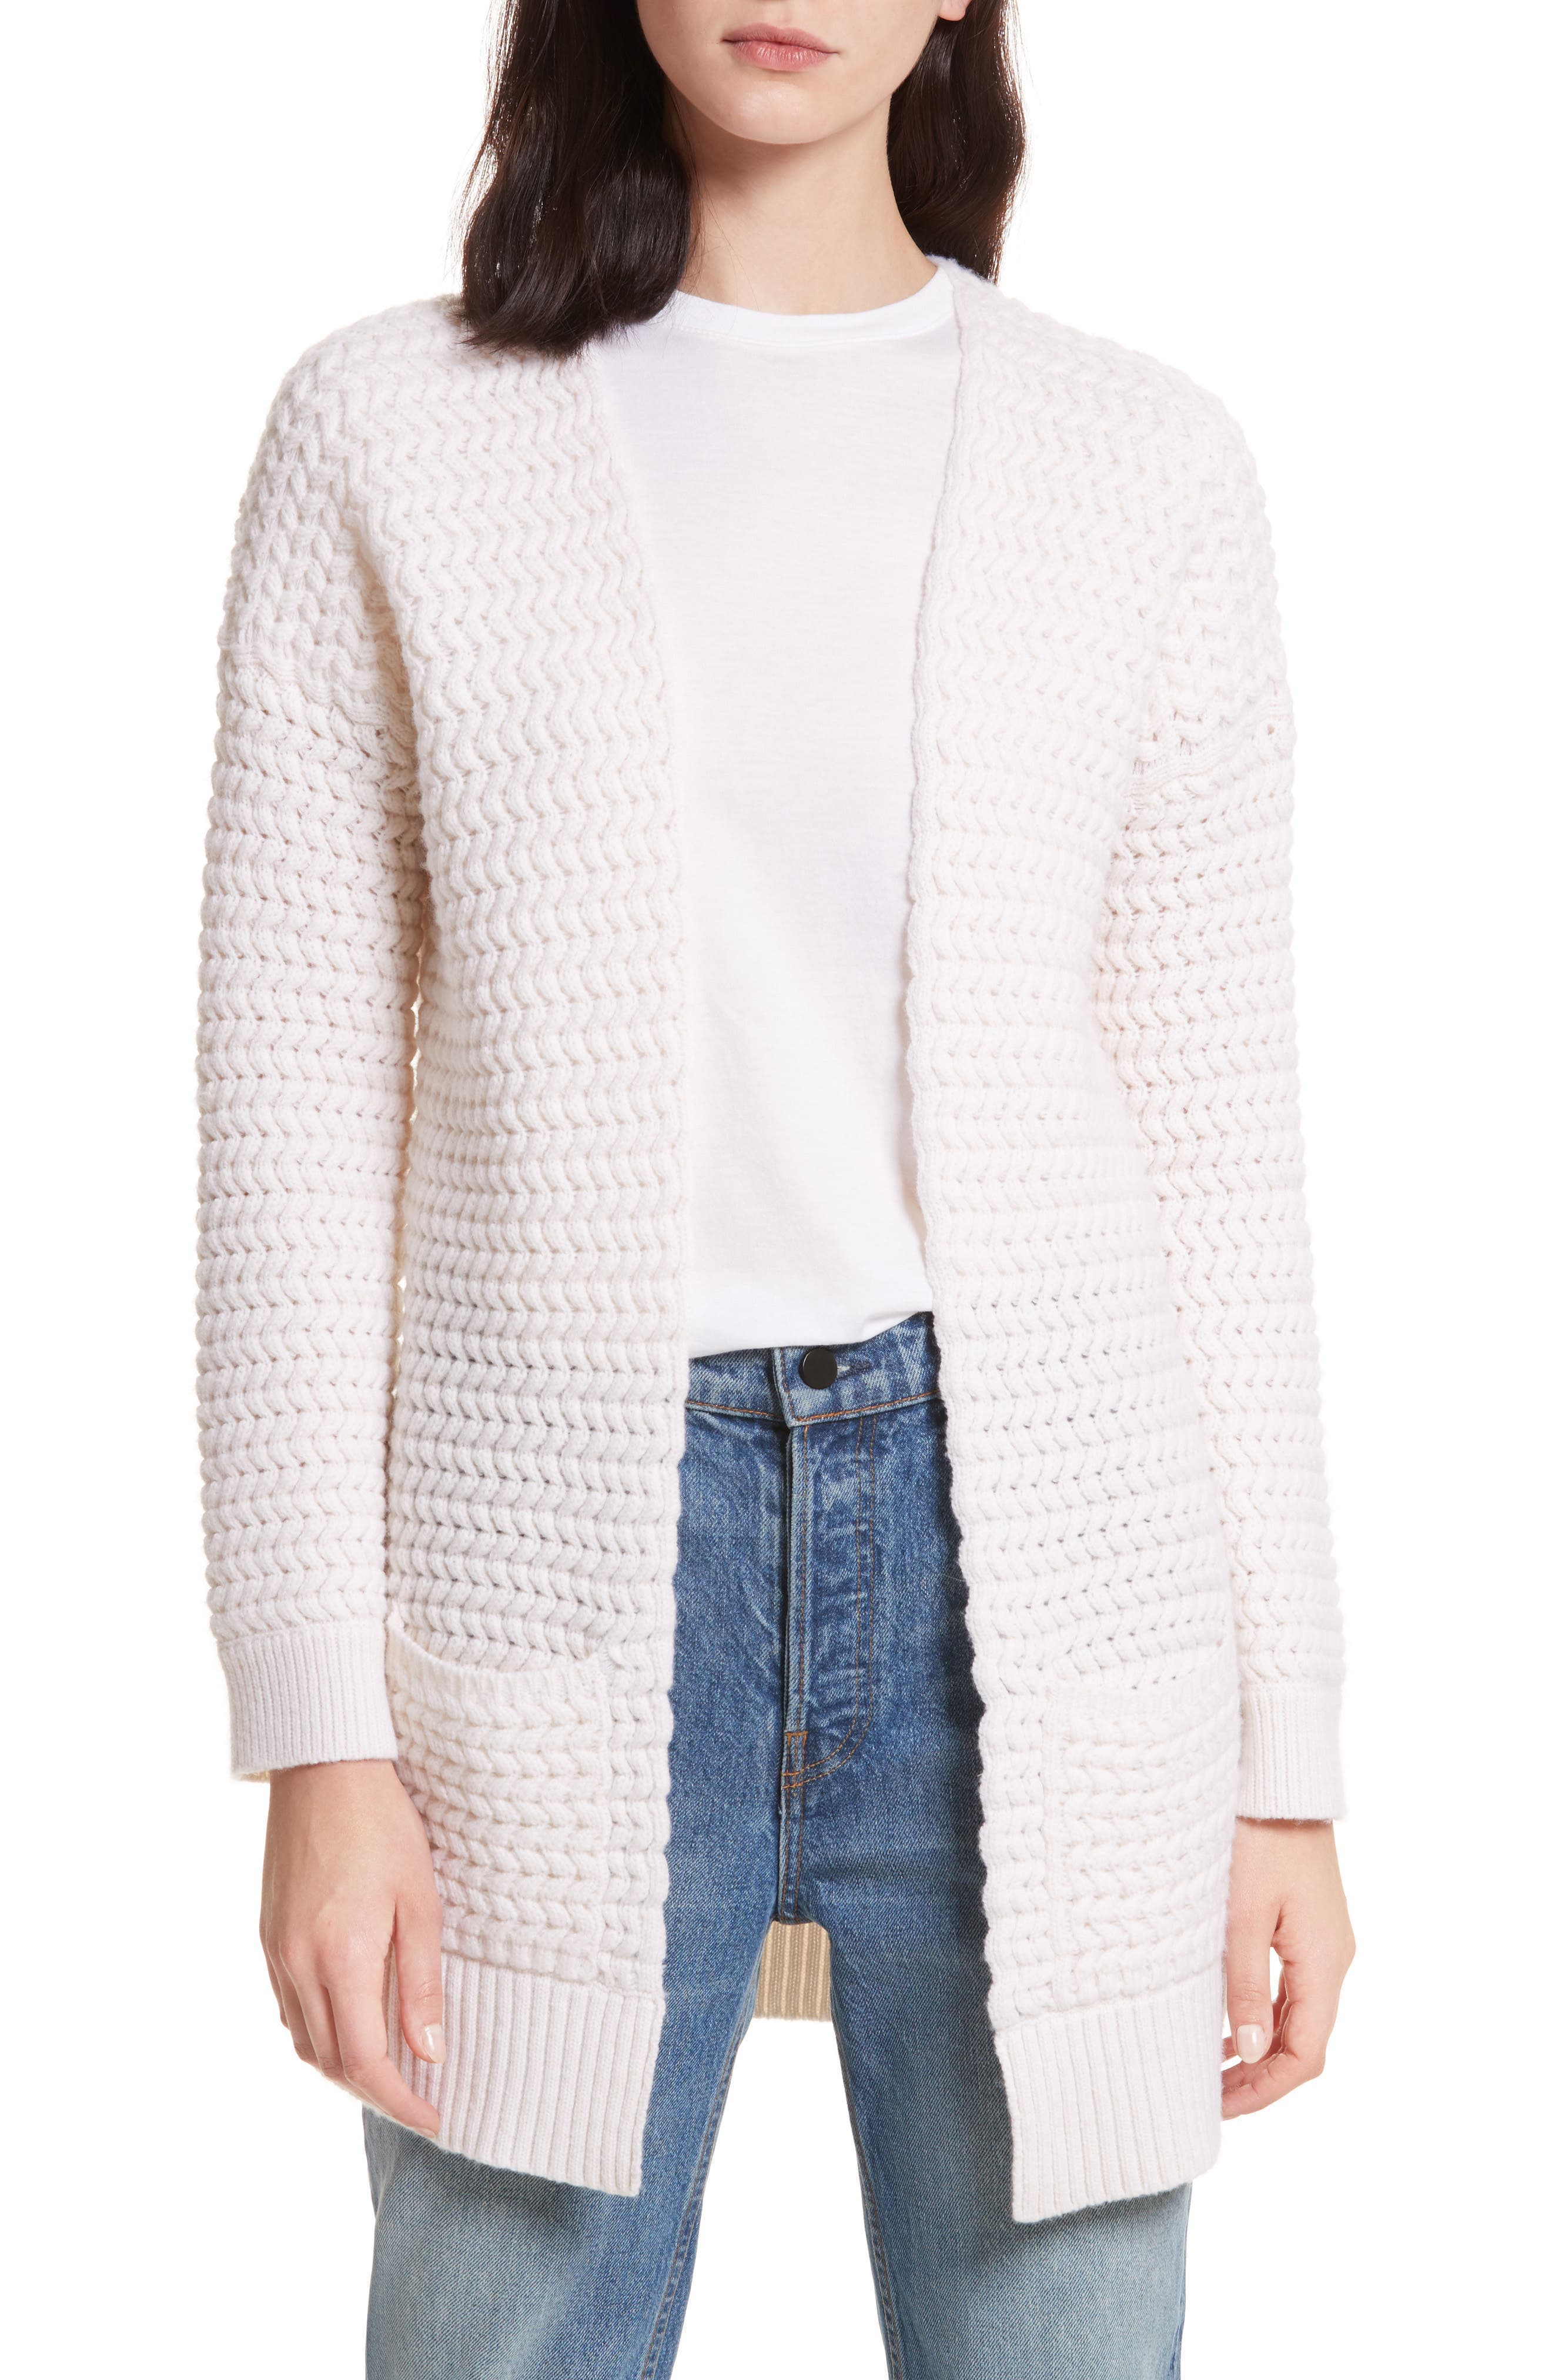 Main Image - Allude Wavy Knit Merino Wool & Cashmere Cardigan